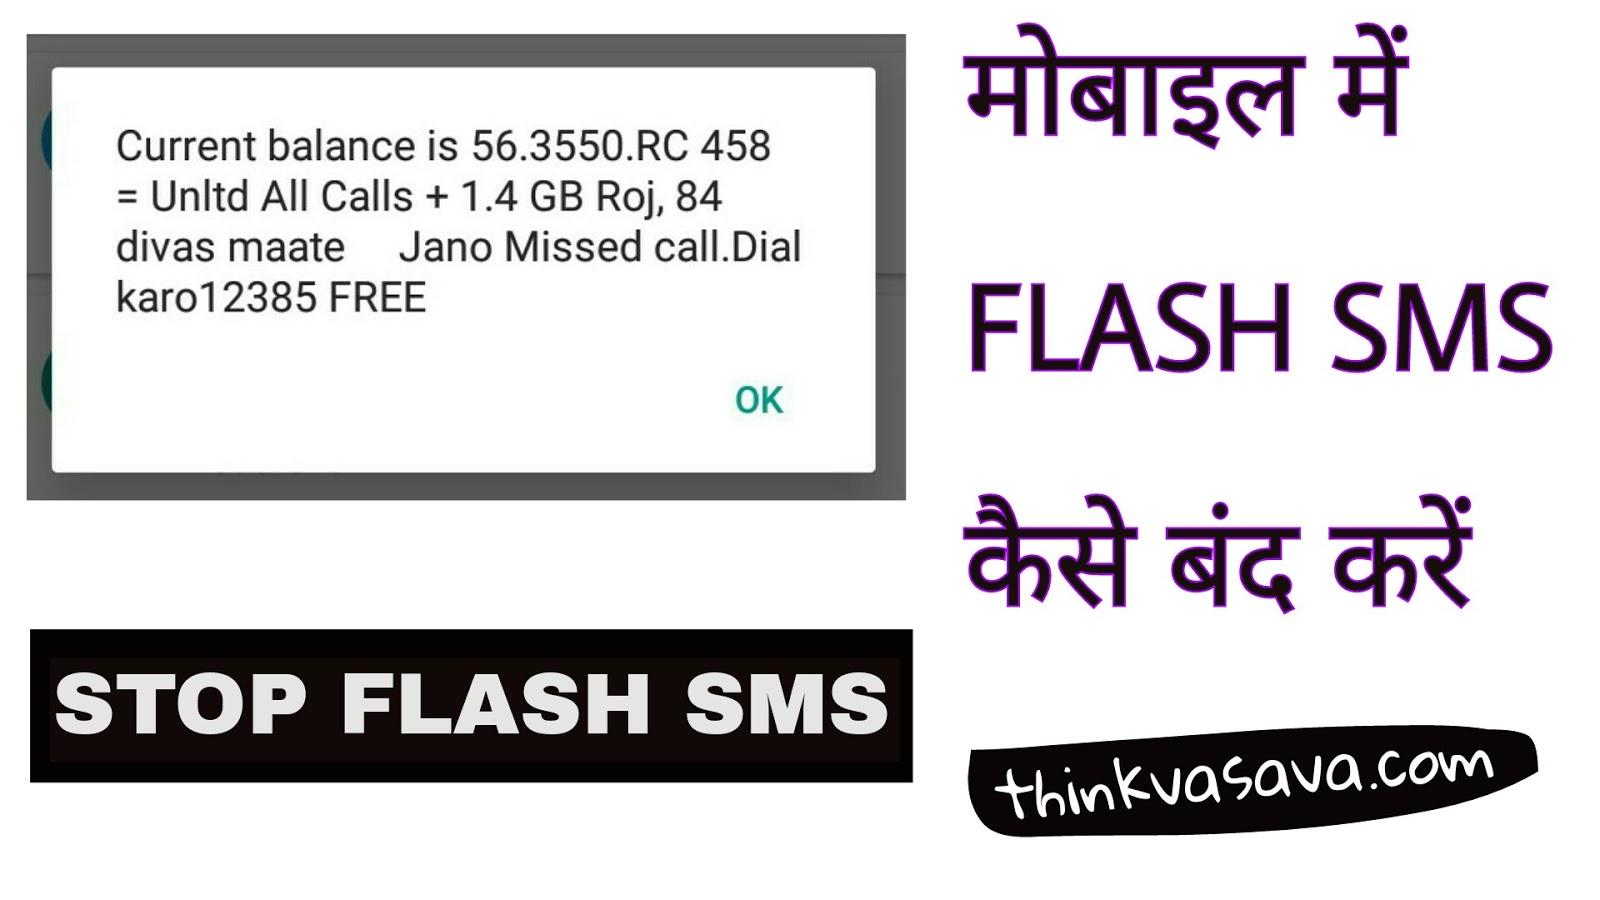 Mobile Me Flash SMS Kaise Stop/Deactivate Kare - Vodafone